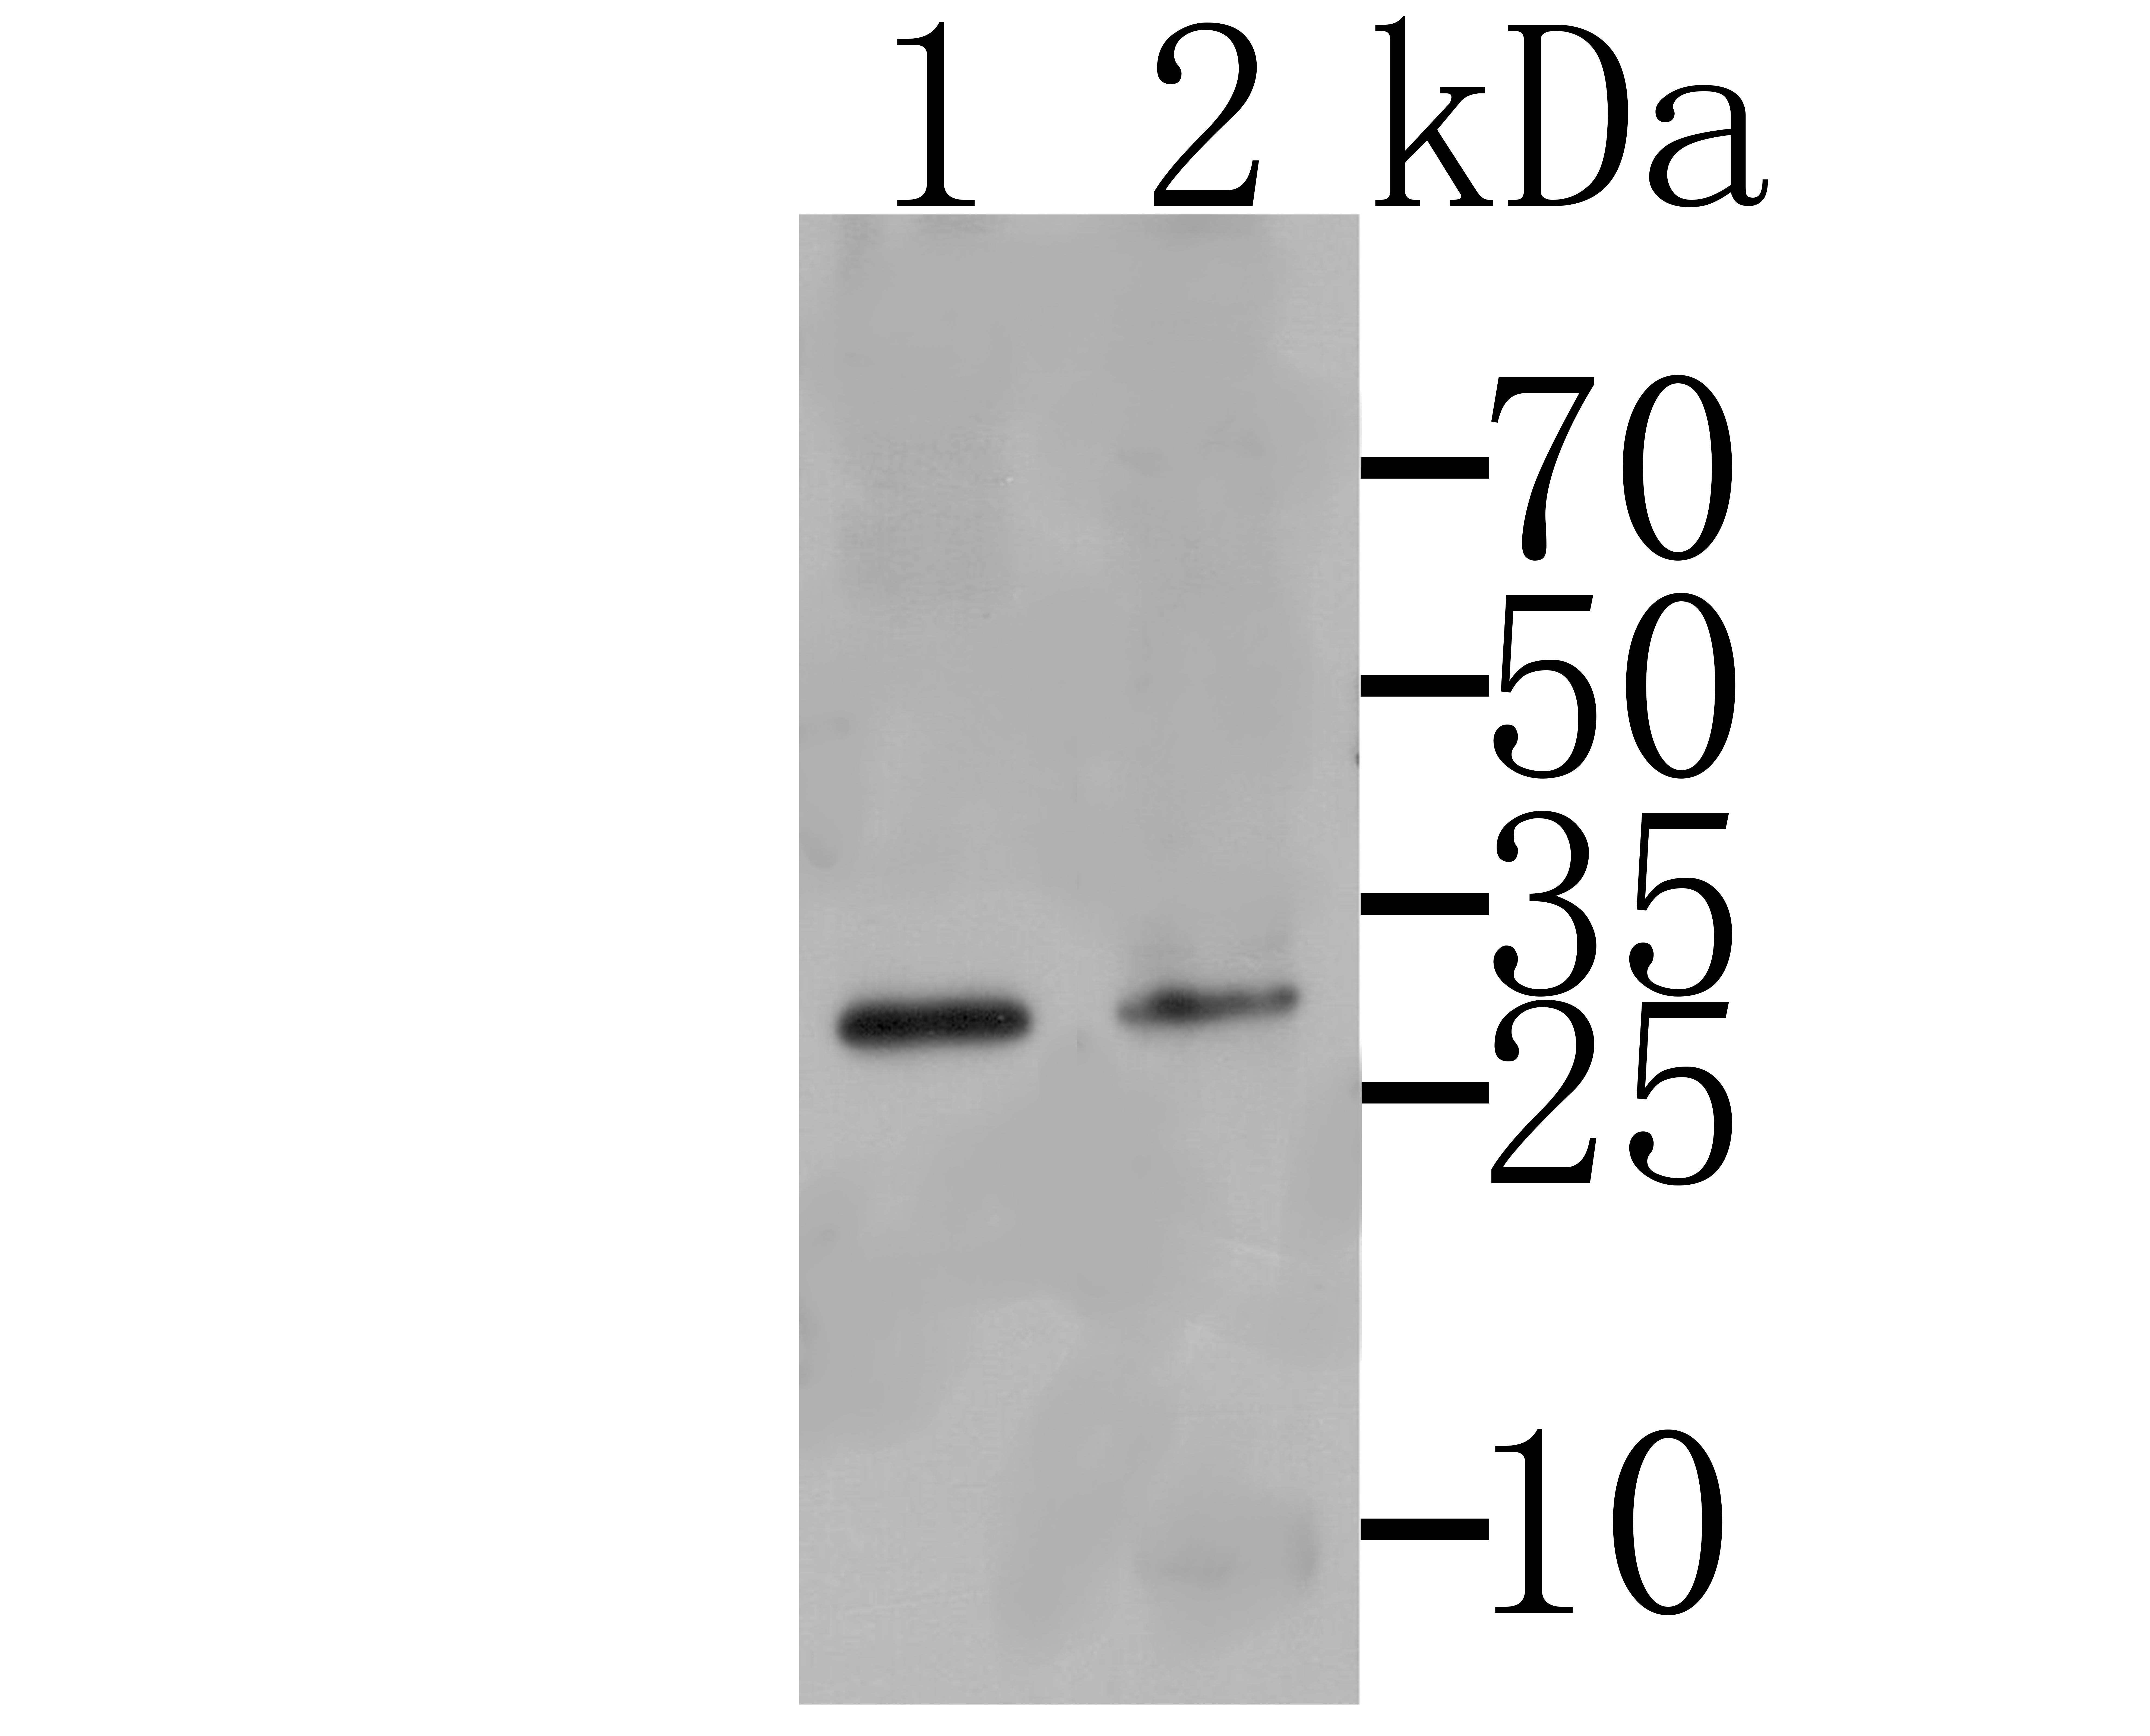 Western blot analysis of Tmem248 on SkBr3 (1) and K562 cells lysates using anti-Tmem248 antibody.